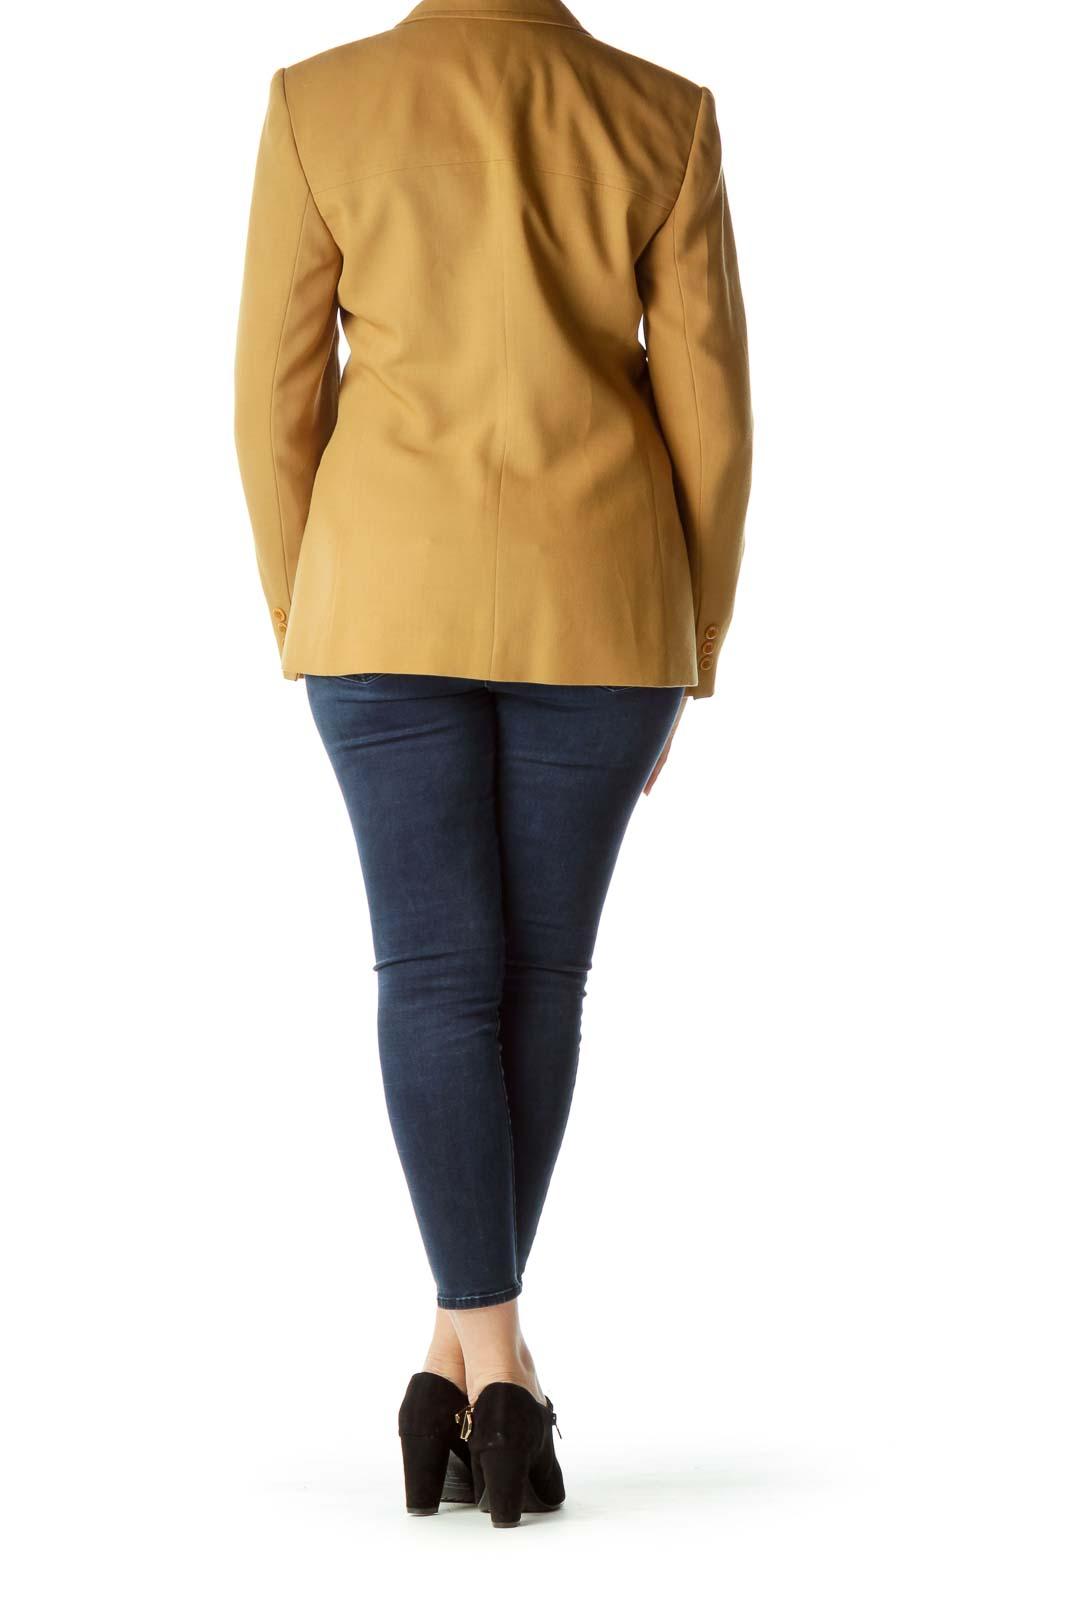 Mustard Yellow Buttoned Blazer